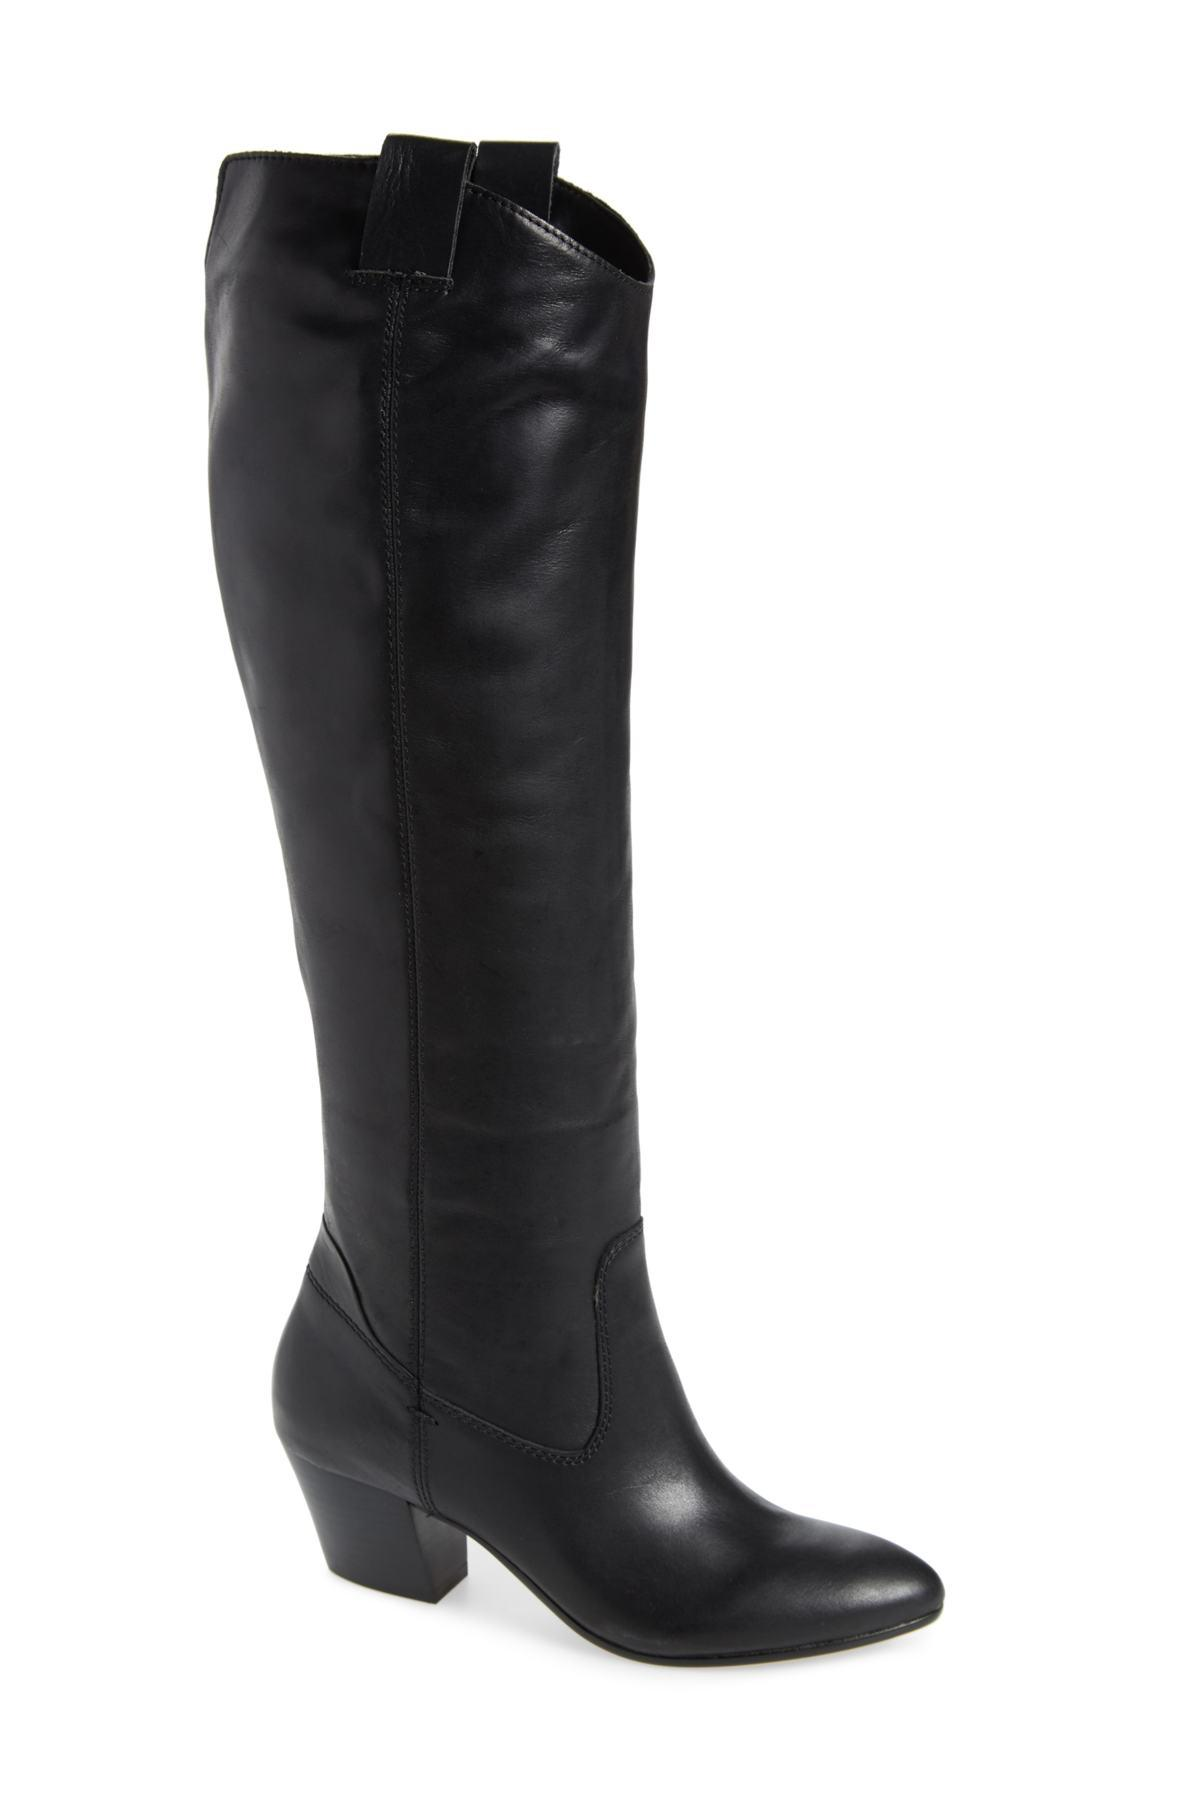 b23e6fc435a Lyst - Dolce Vita Hinley Knee High Boot (women) in Black